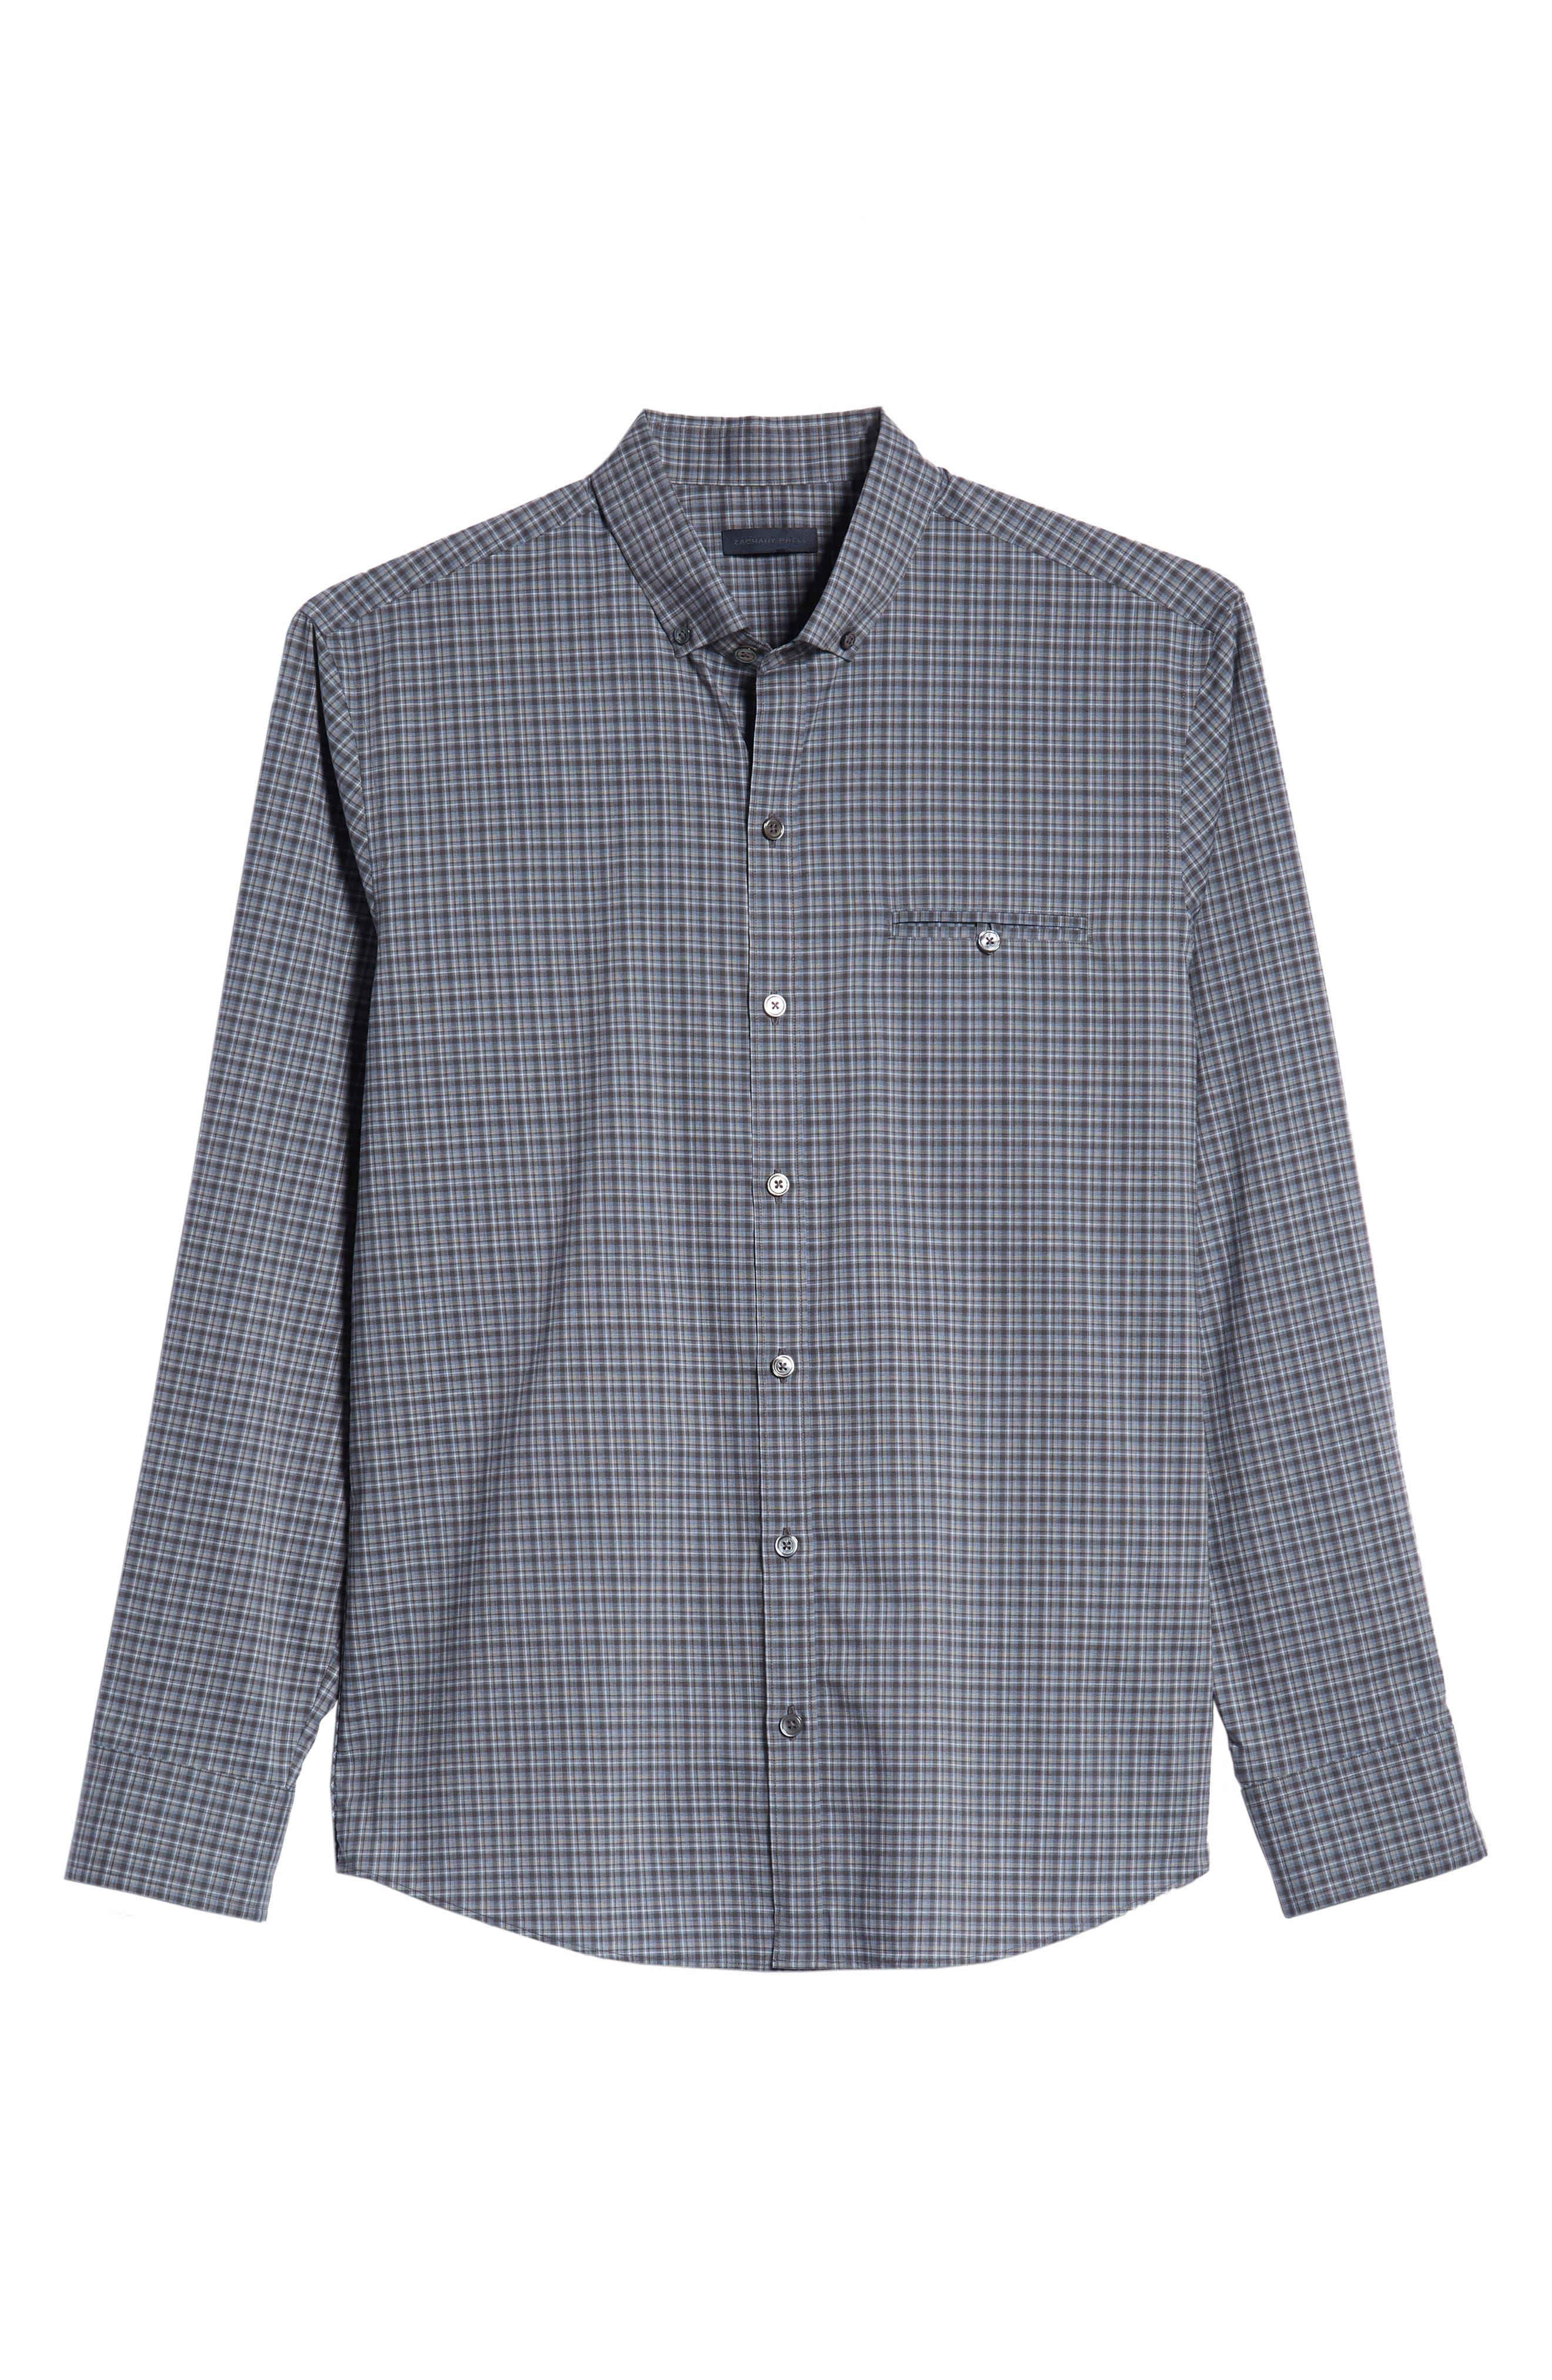 ZACHARY PRELL,                             Chu Regular Fit Plaid Sport Shirt,                             Alternate thumbnail 5, color,                             021